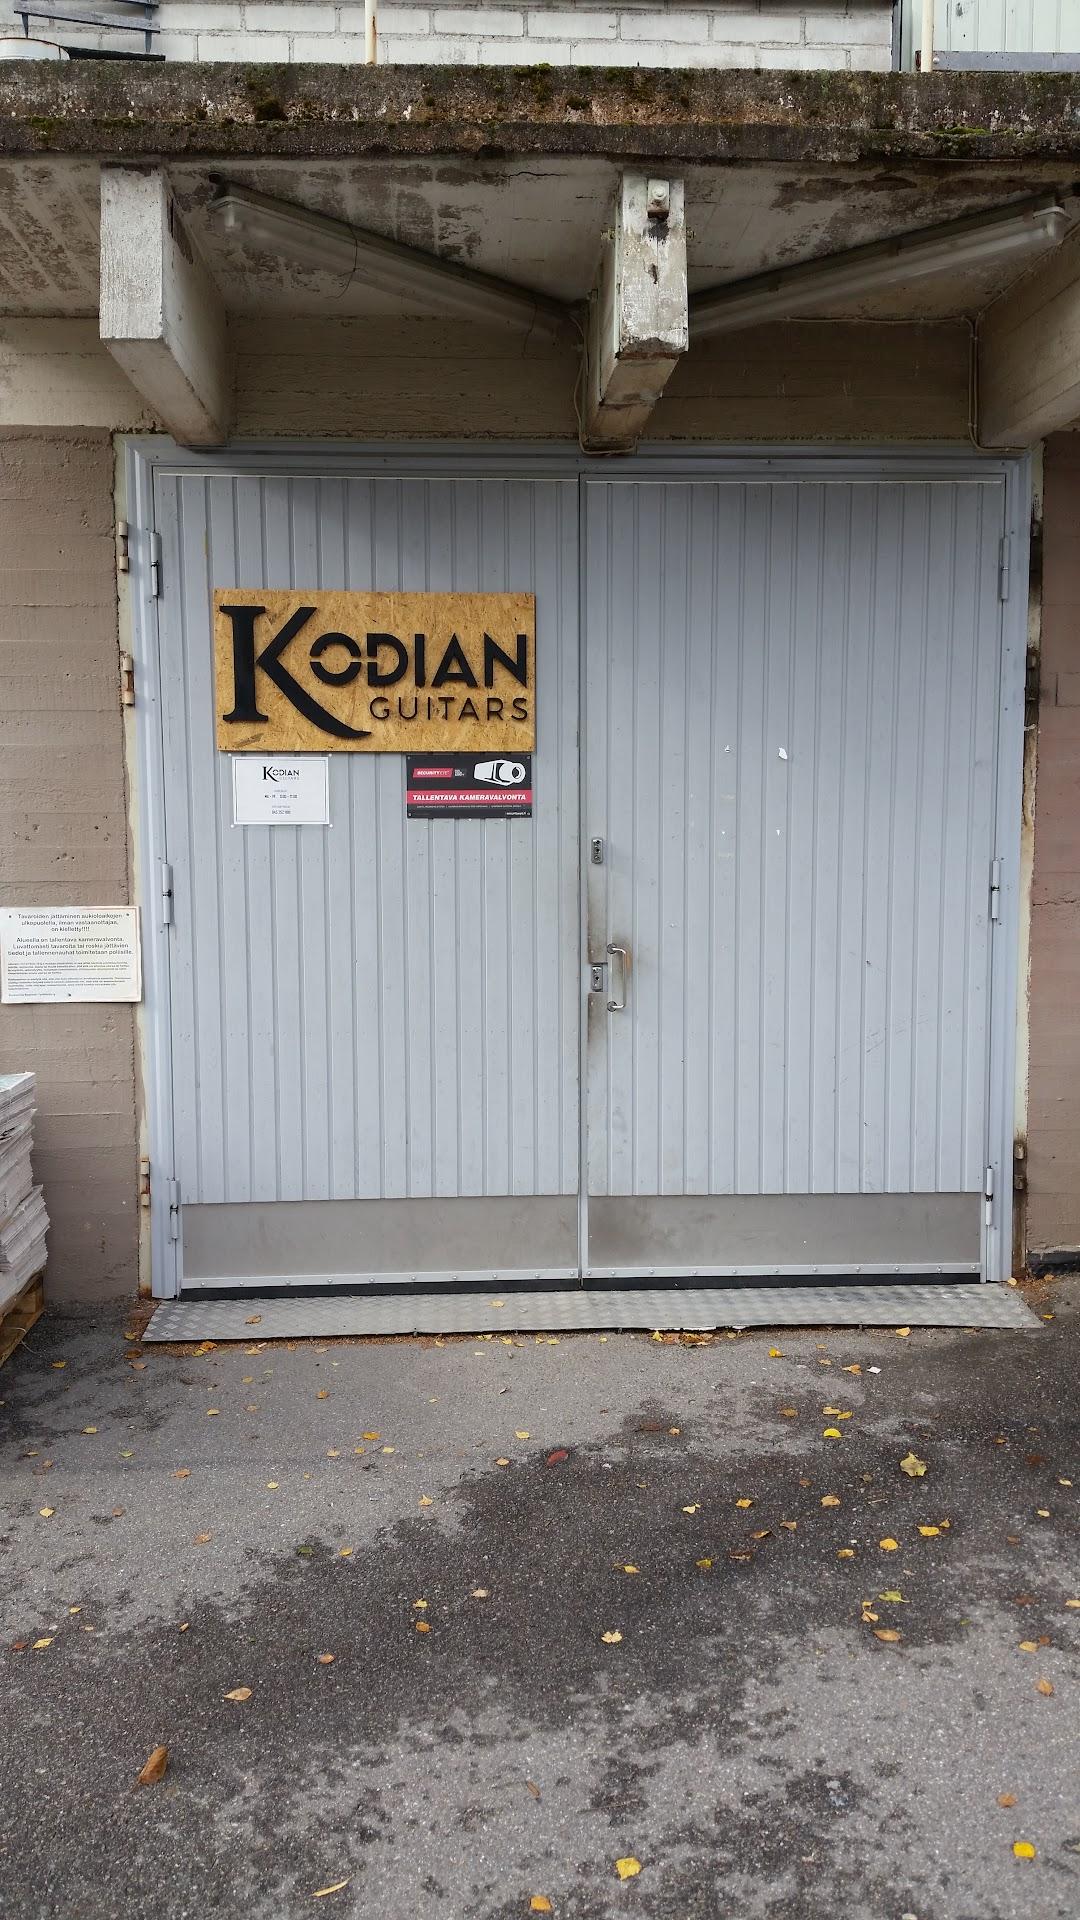 Kodian Guitars Oy